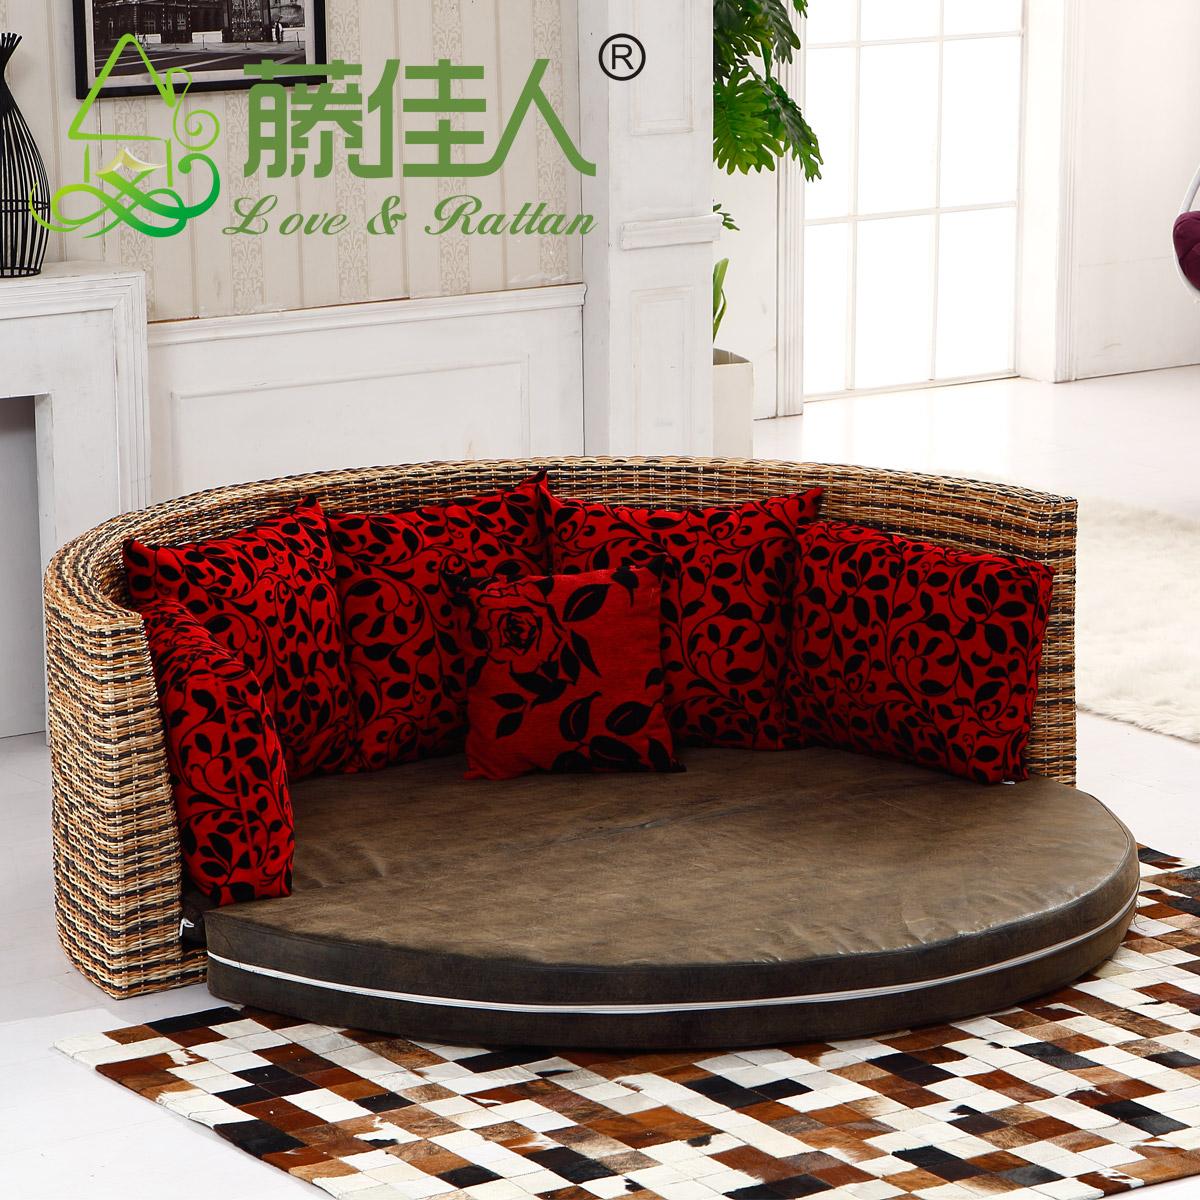 Диван-кровать Love & Rattan white rattan sofa purple cushions garden outdoor patio sofa rattan furniture swing pool table chair rattan sofa set